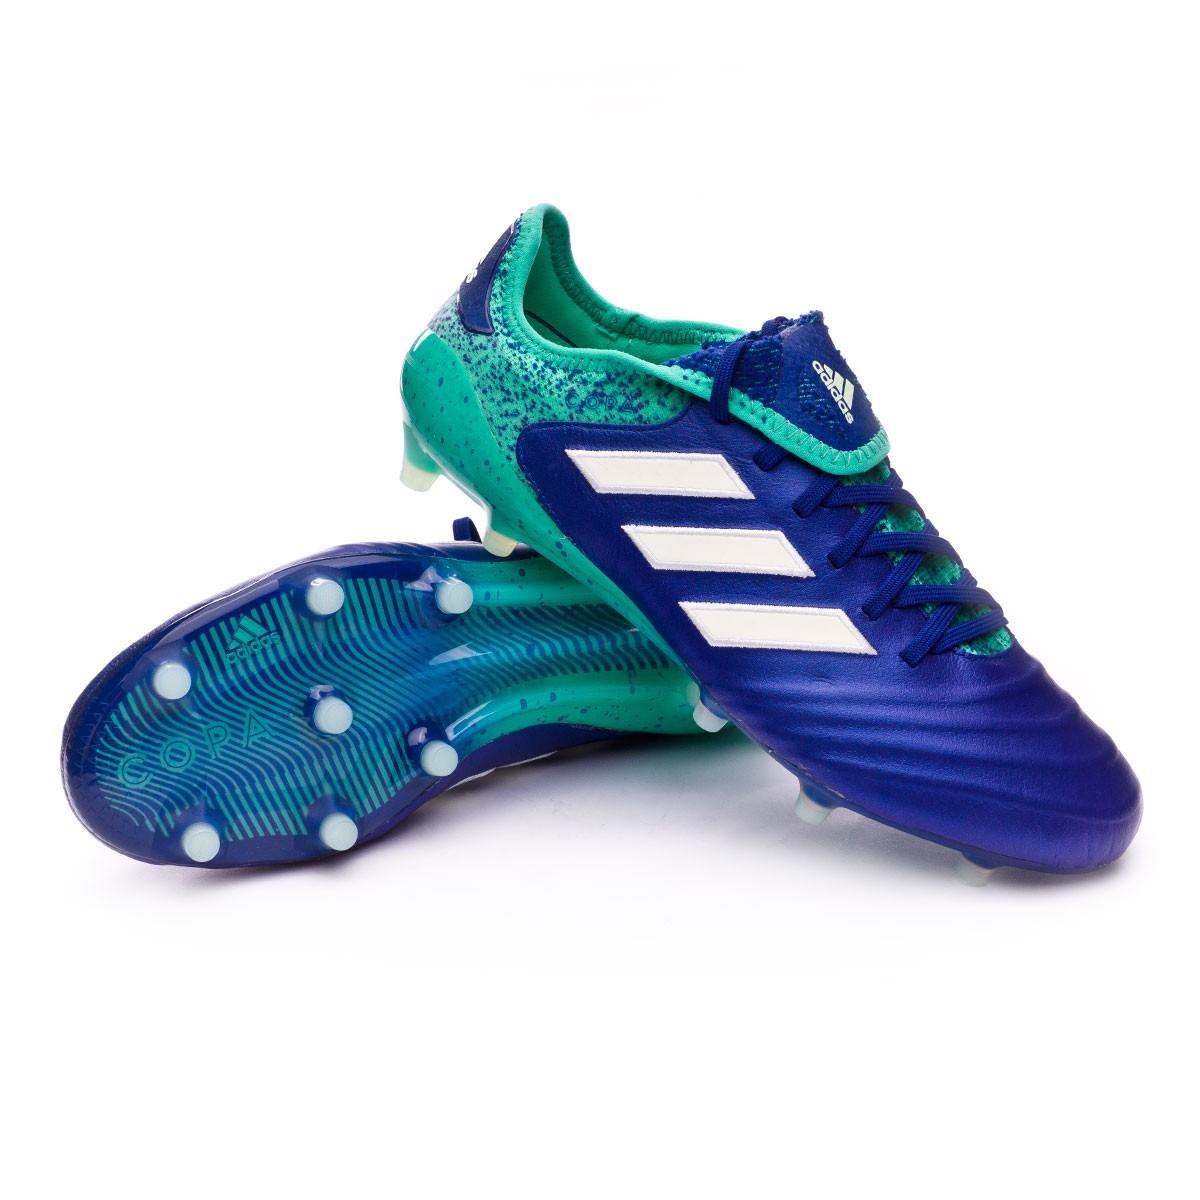 Scarpe adidas Copa 18.1 FG Unity ink Aero green Hi res green